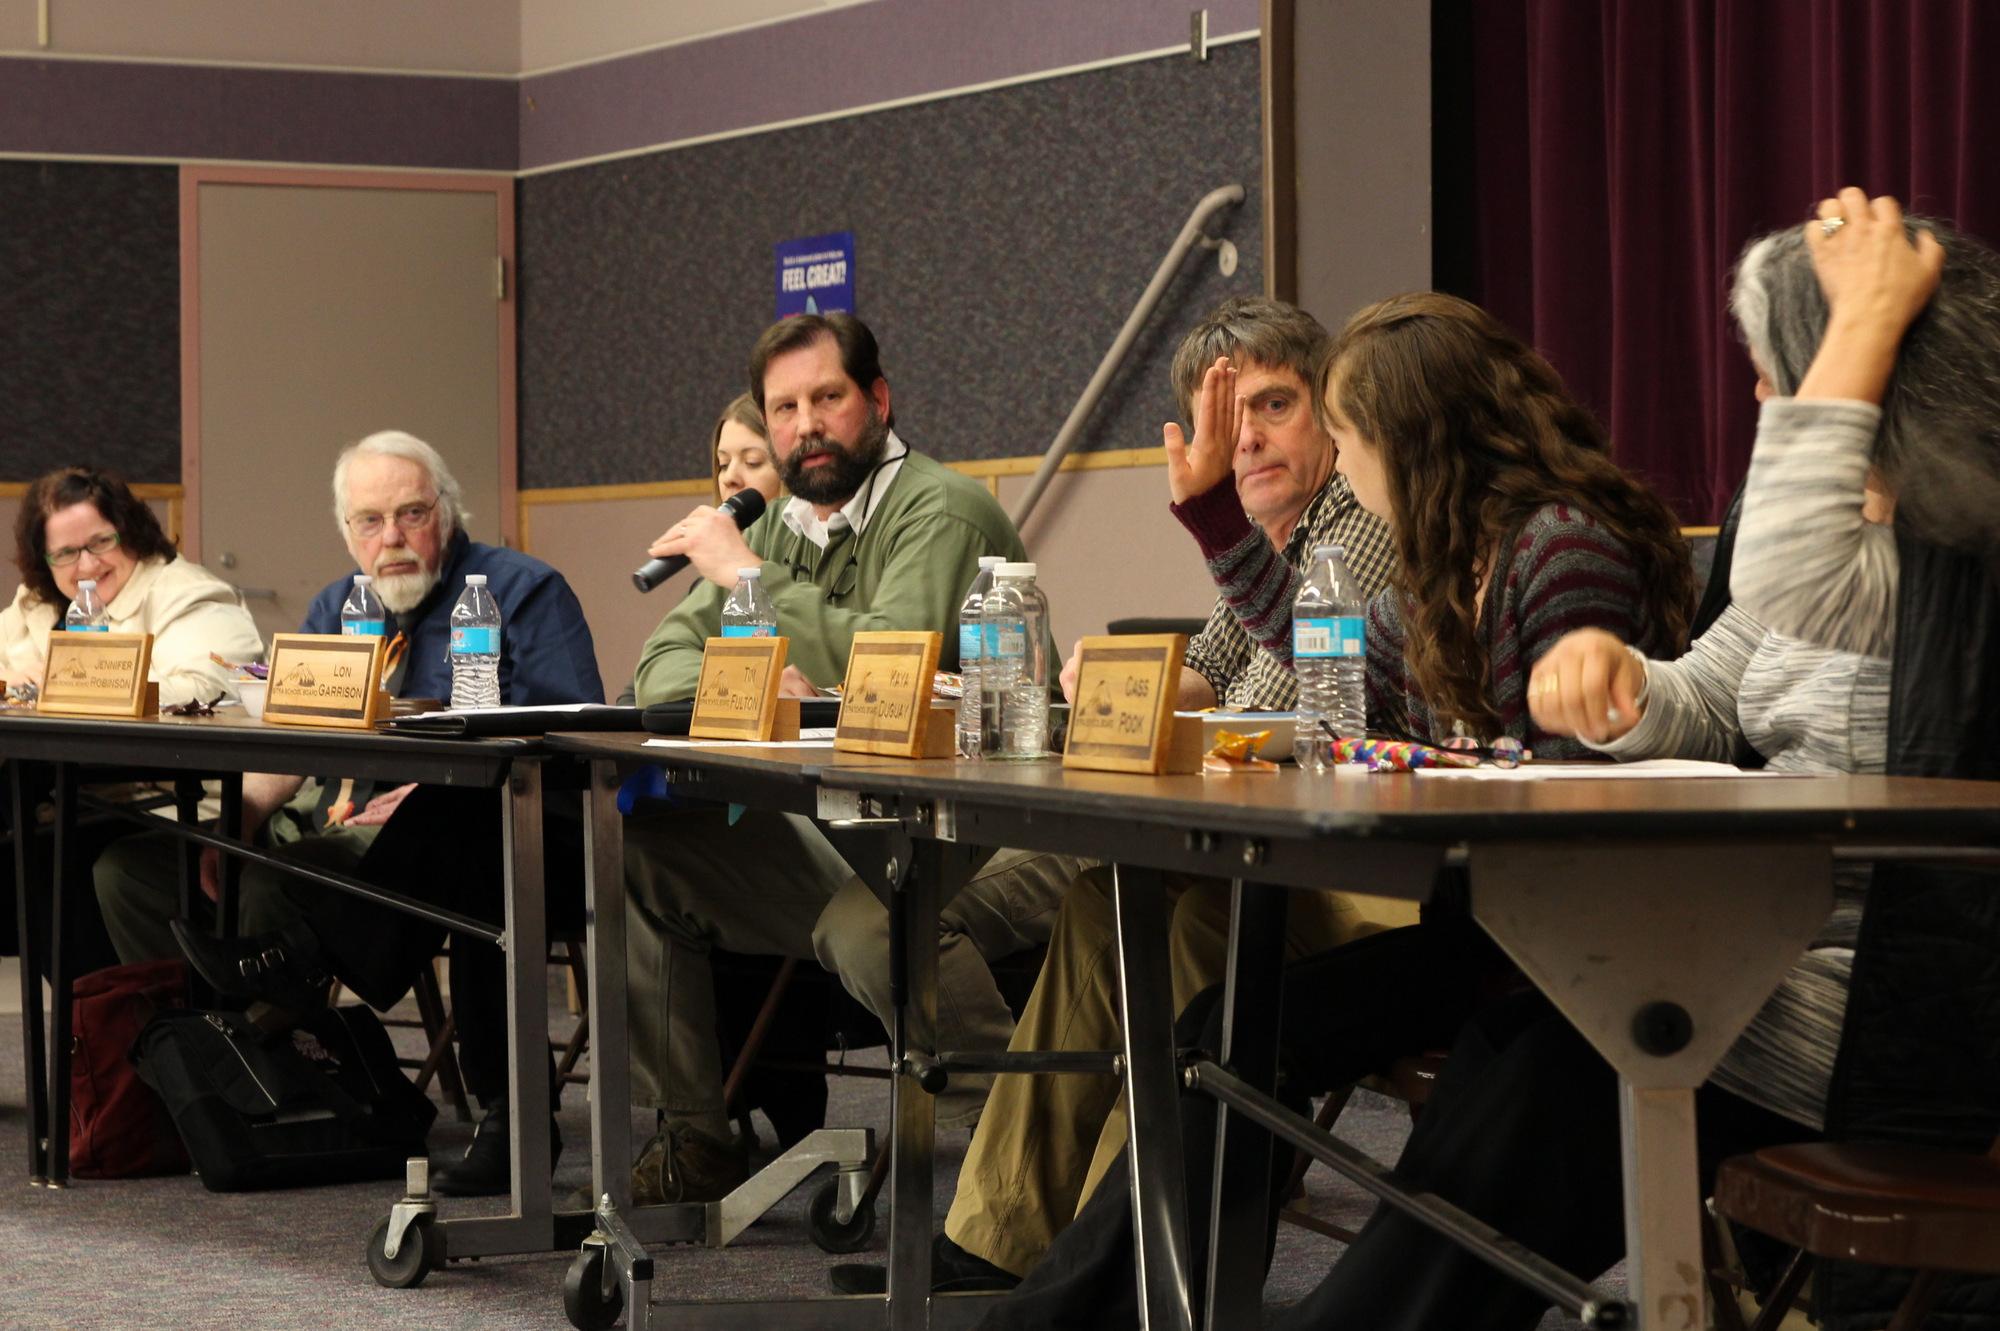 School Board postpones final budget vote after city protests